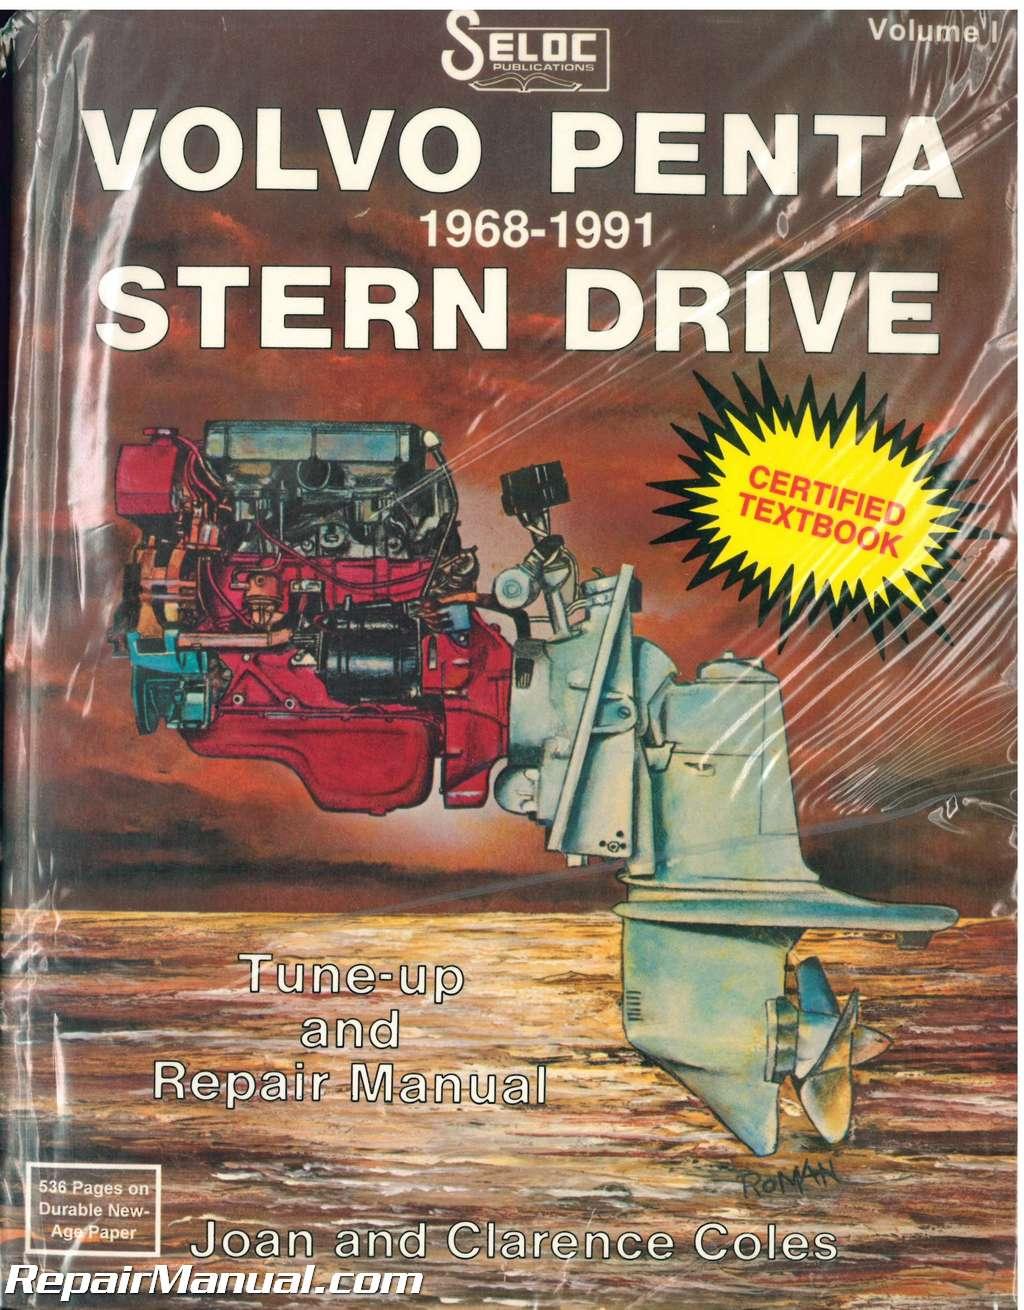 used seloc volvo penta stern drive 1968 1991 boat engine repair manual rh repairmanual com volvo penta stern drive manual free download volvo penta stern drive manual free download